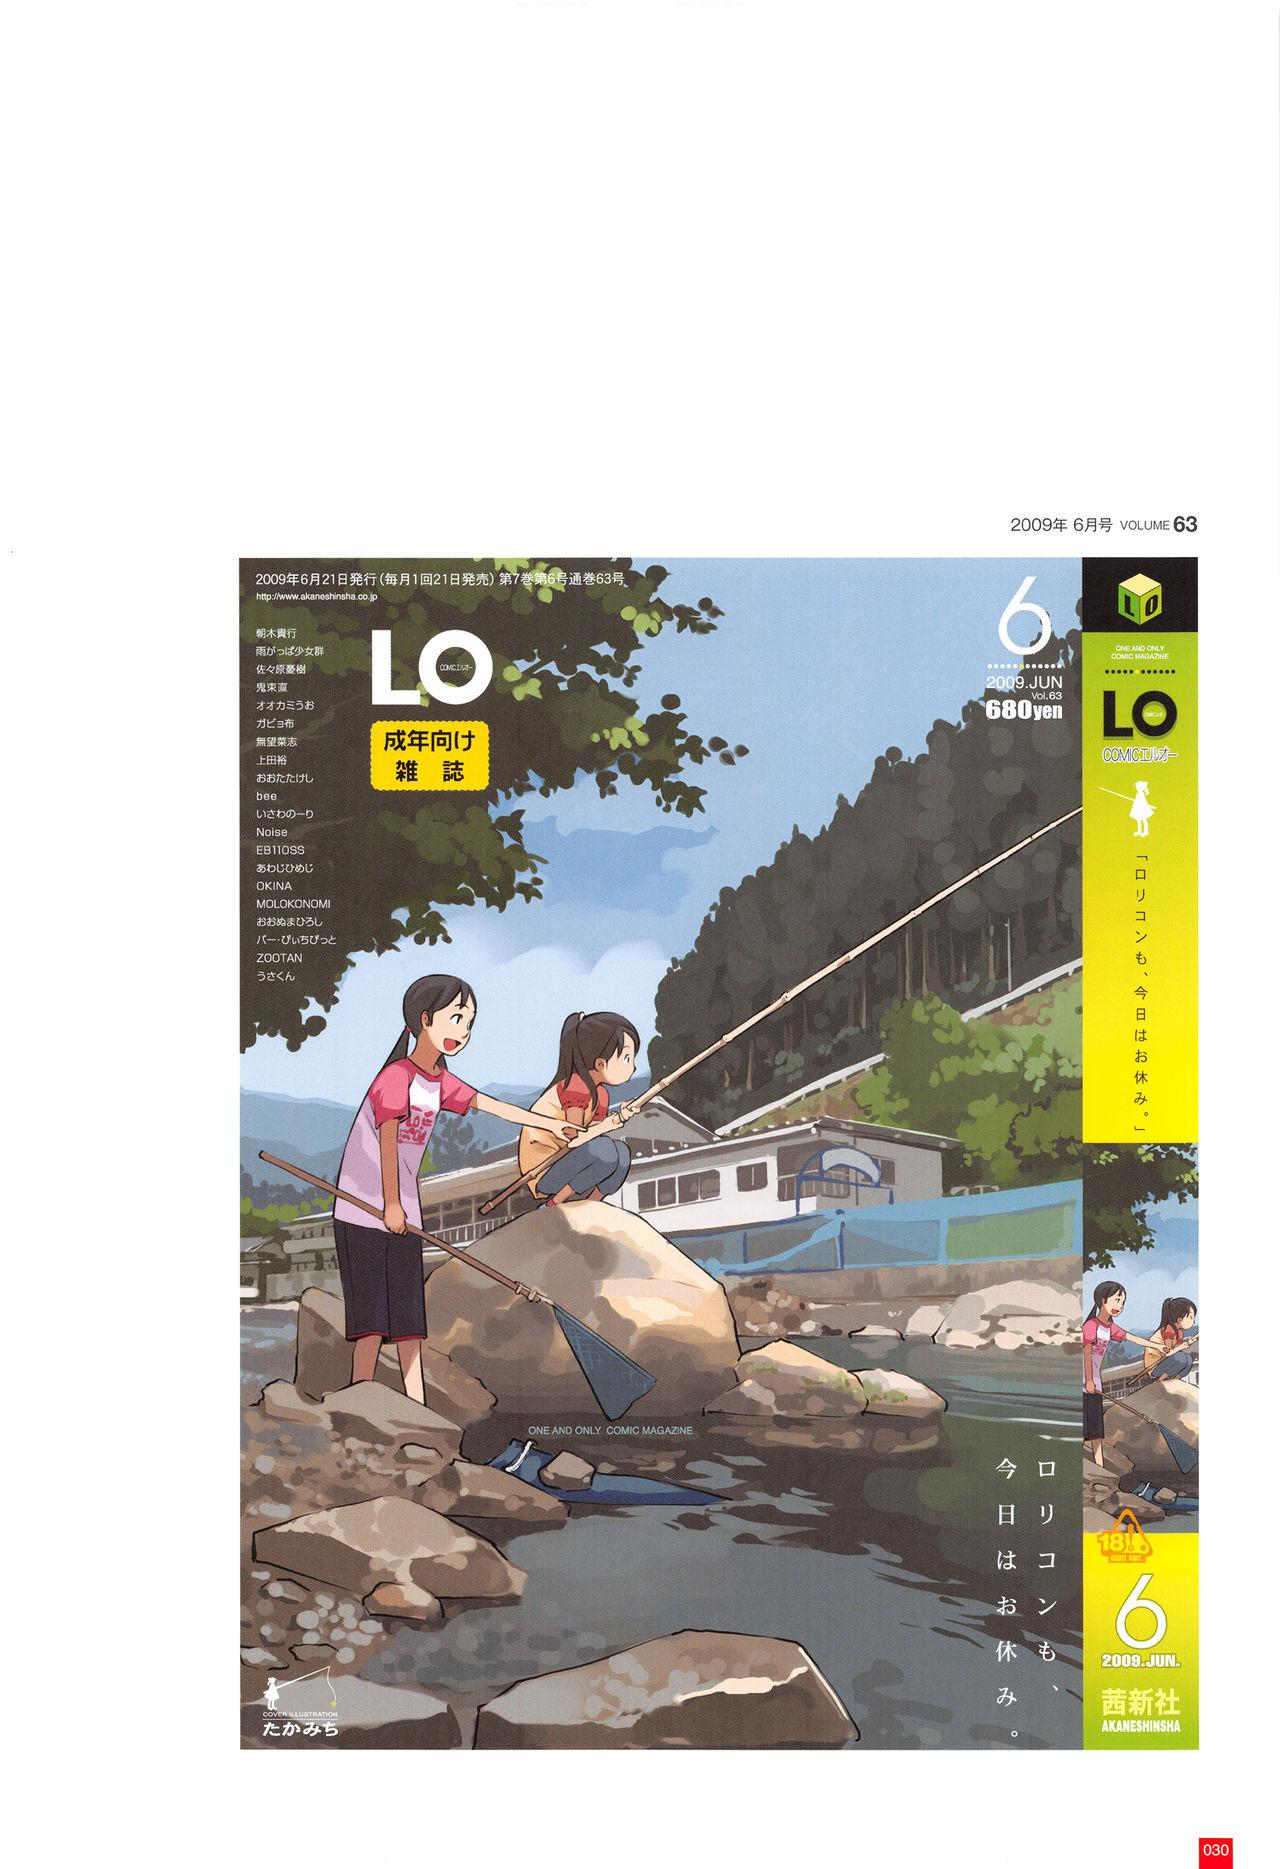 LO Artbook 2-A TAKAMICHI LOOP WORKS 32